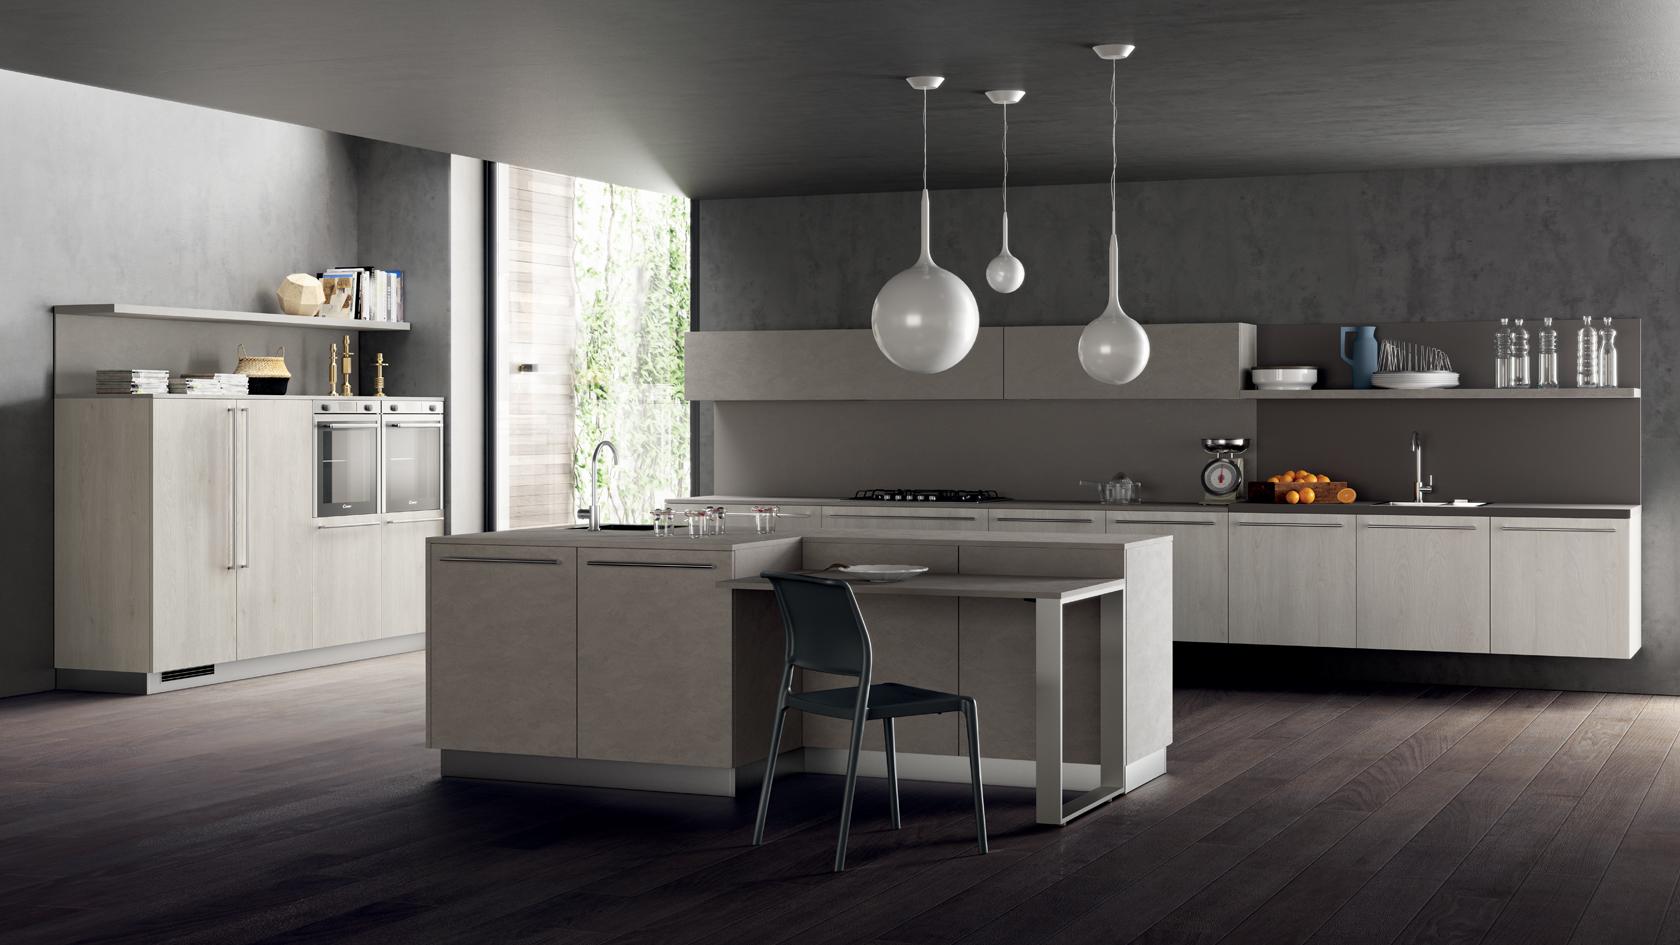 Cucina Moderna Scavolini Moodi-mobili incardone